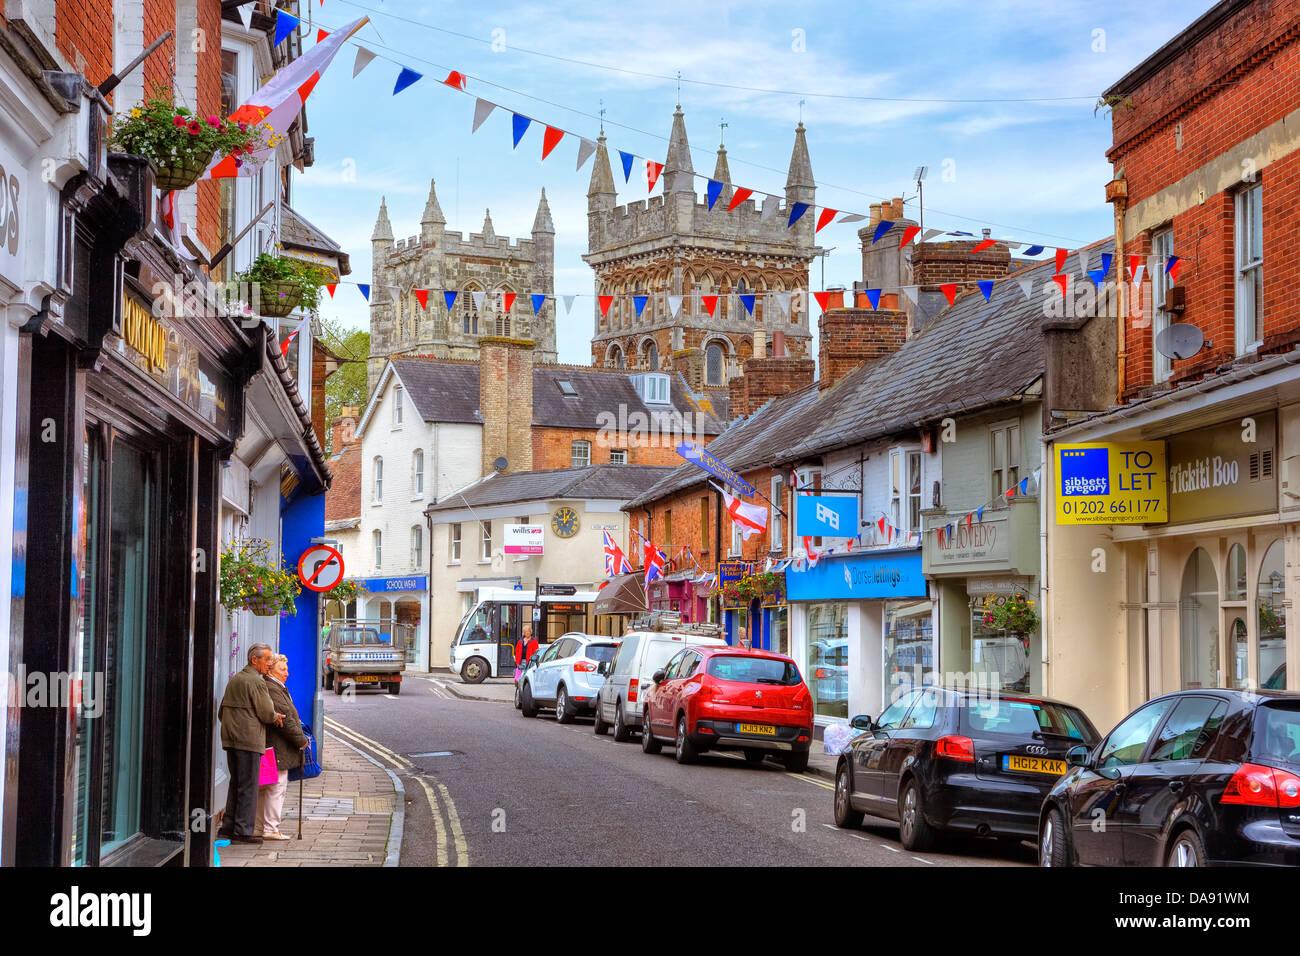 Wimborne Minster, Dorset, United Kingdom - Stock Image